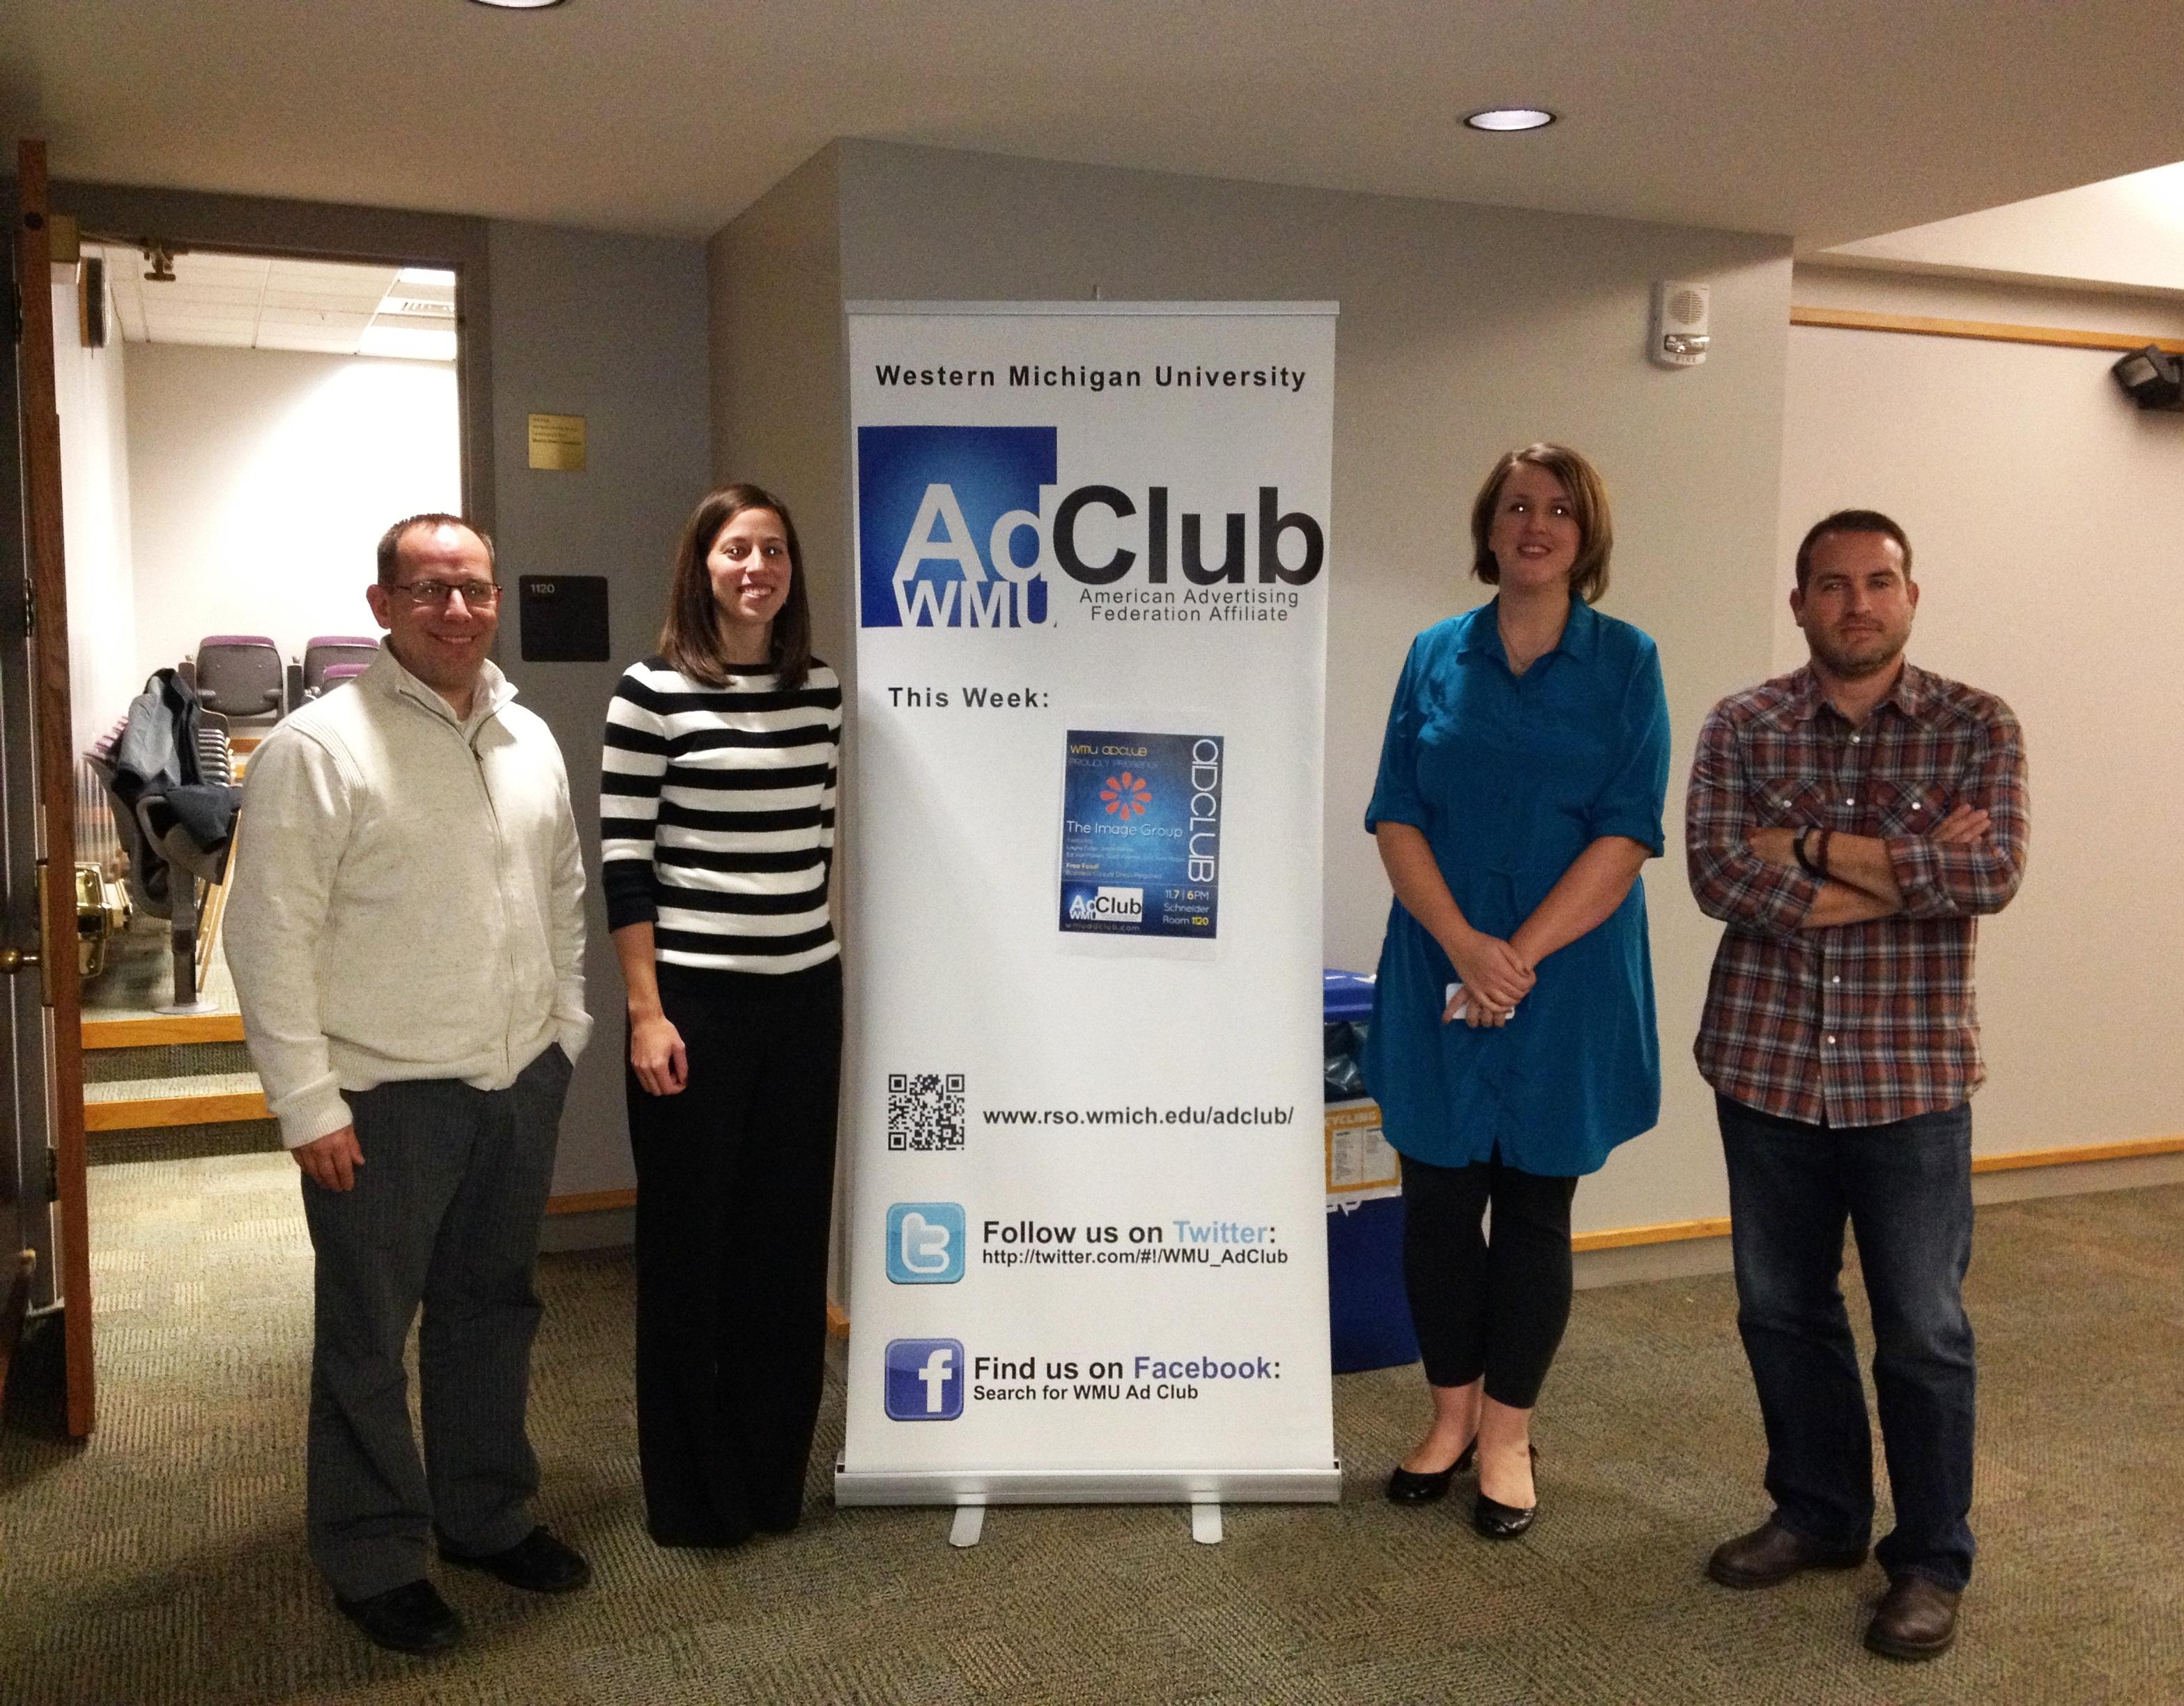 Image+Group+at+AdClub